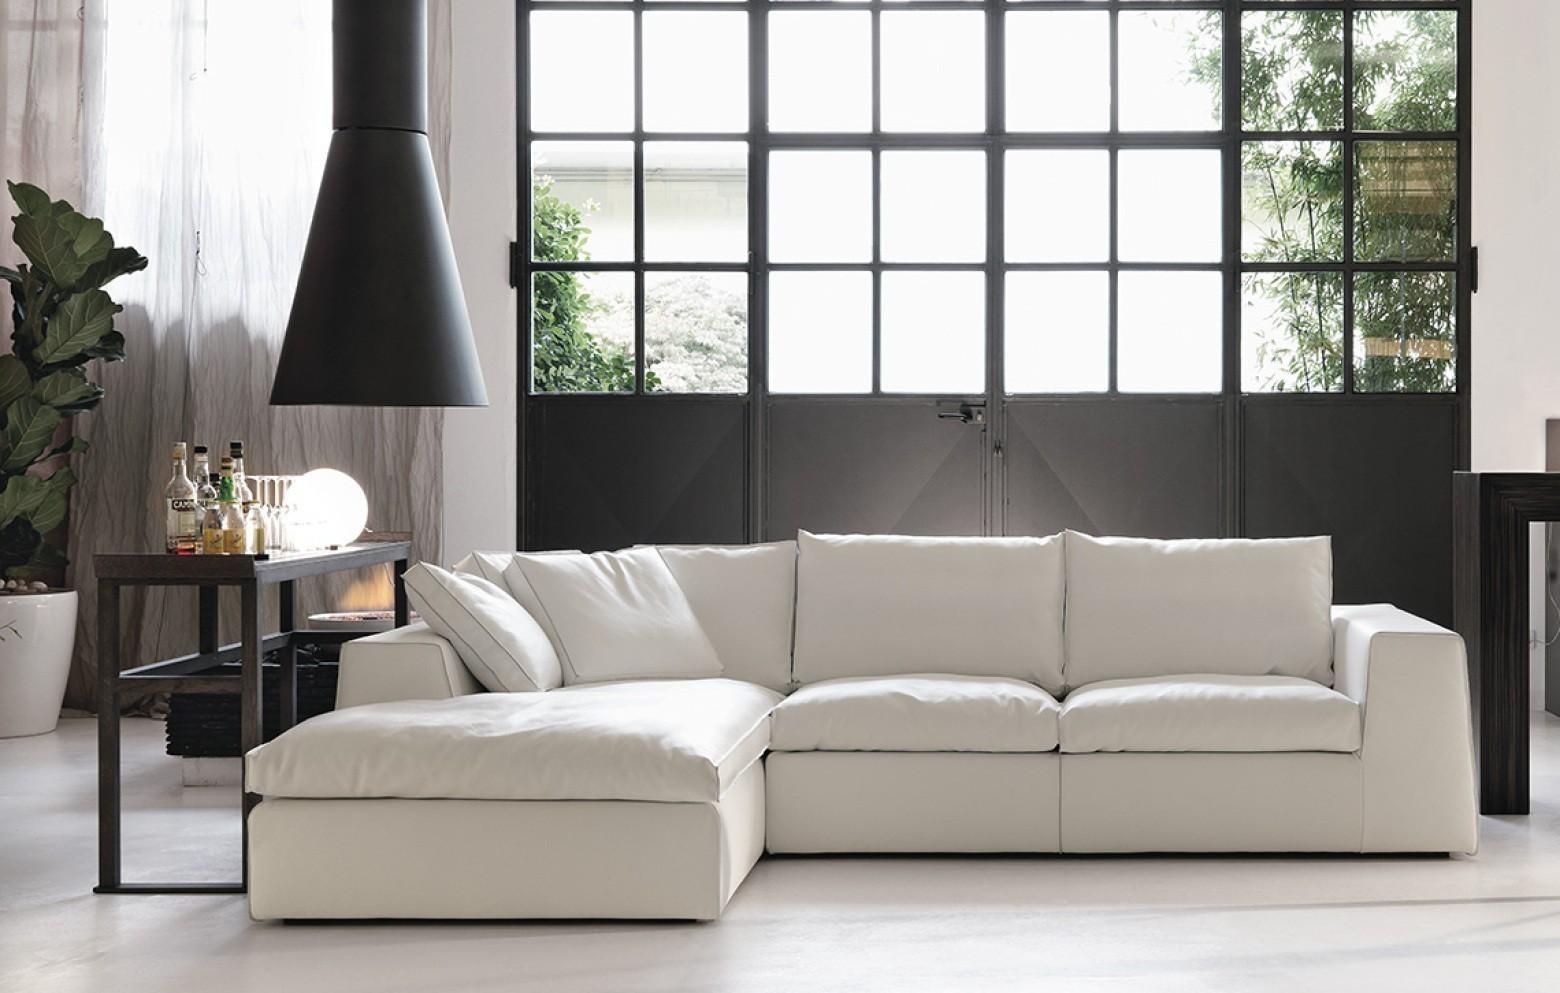 james ecksofas polsterm bel who 39 s perfect. Black Bedroom Furniture Sets. Home Design Ideas